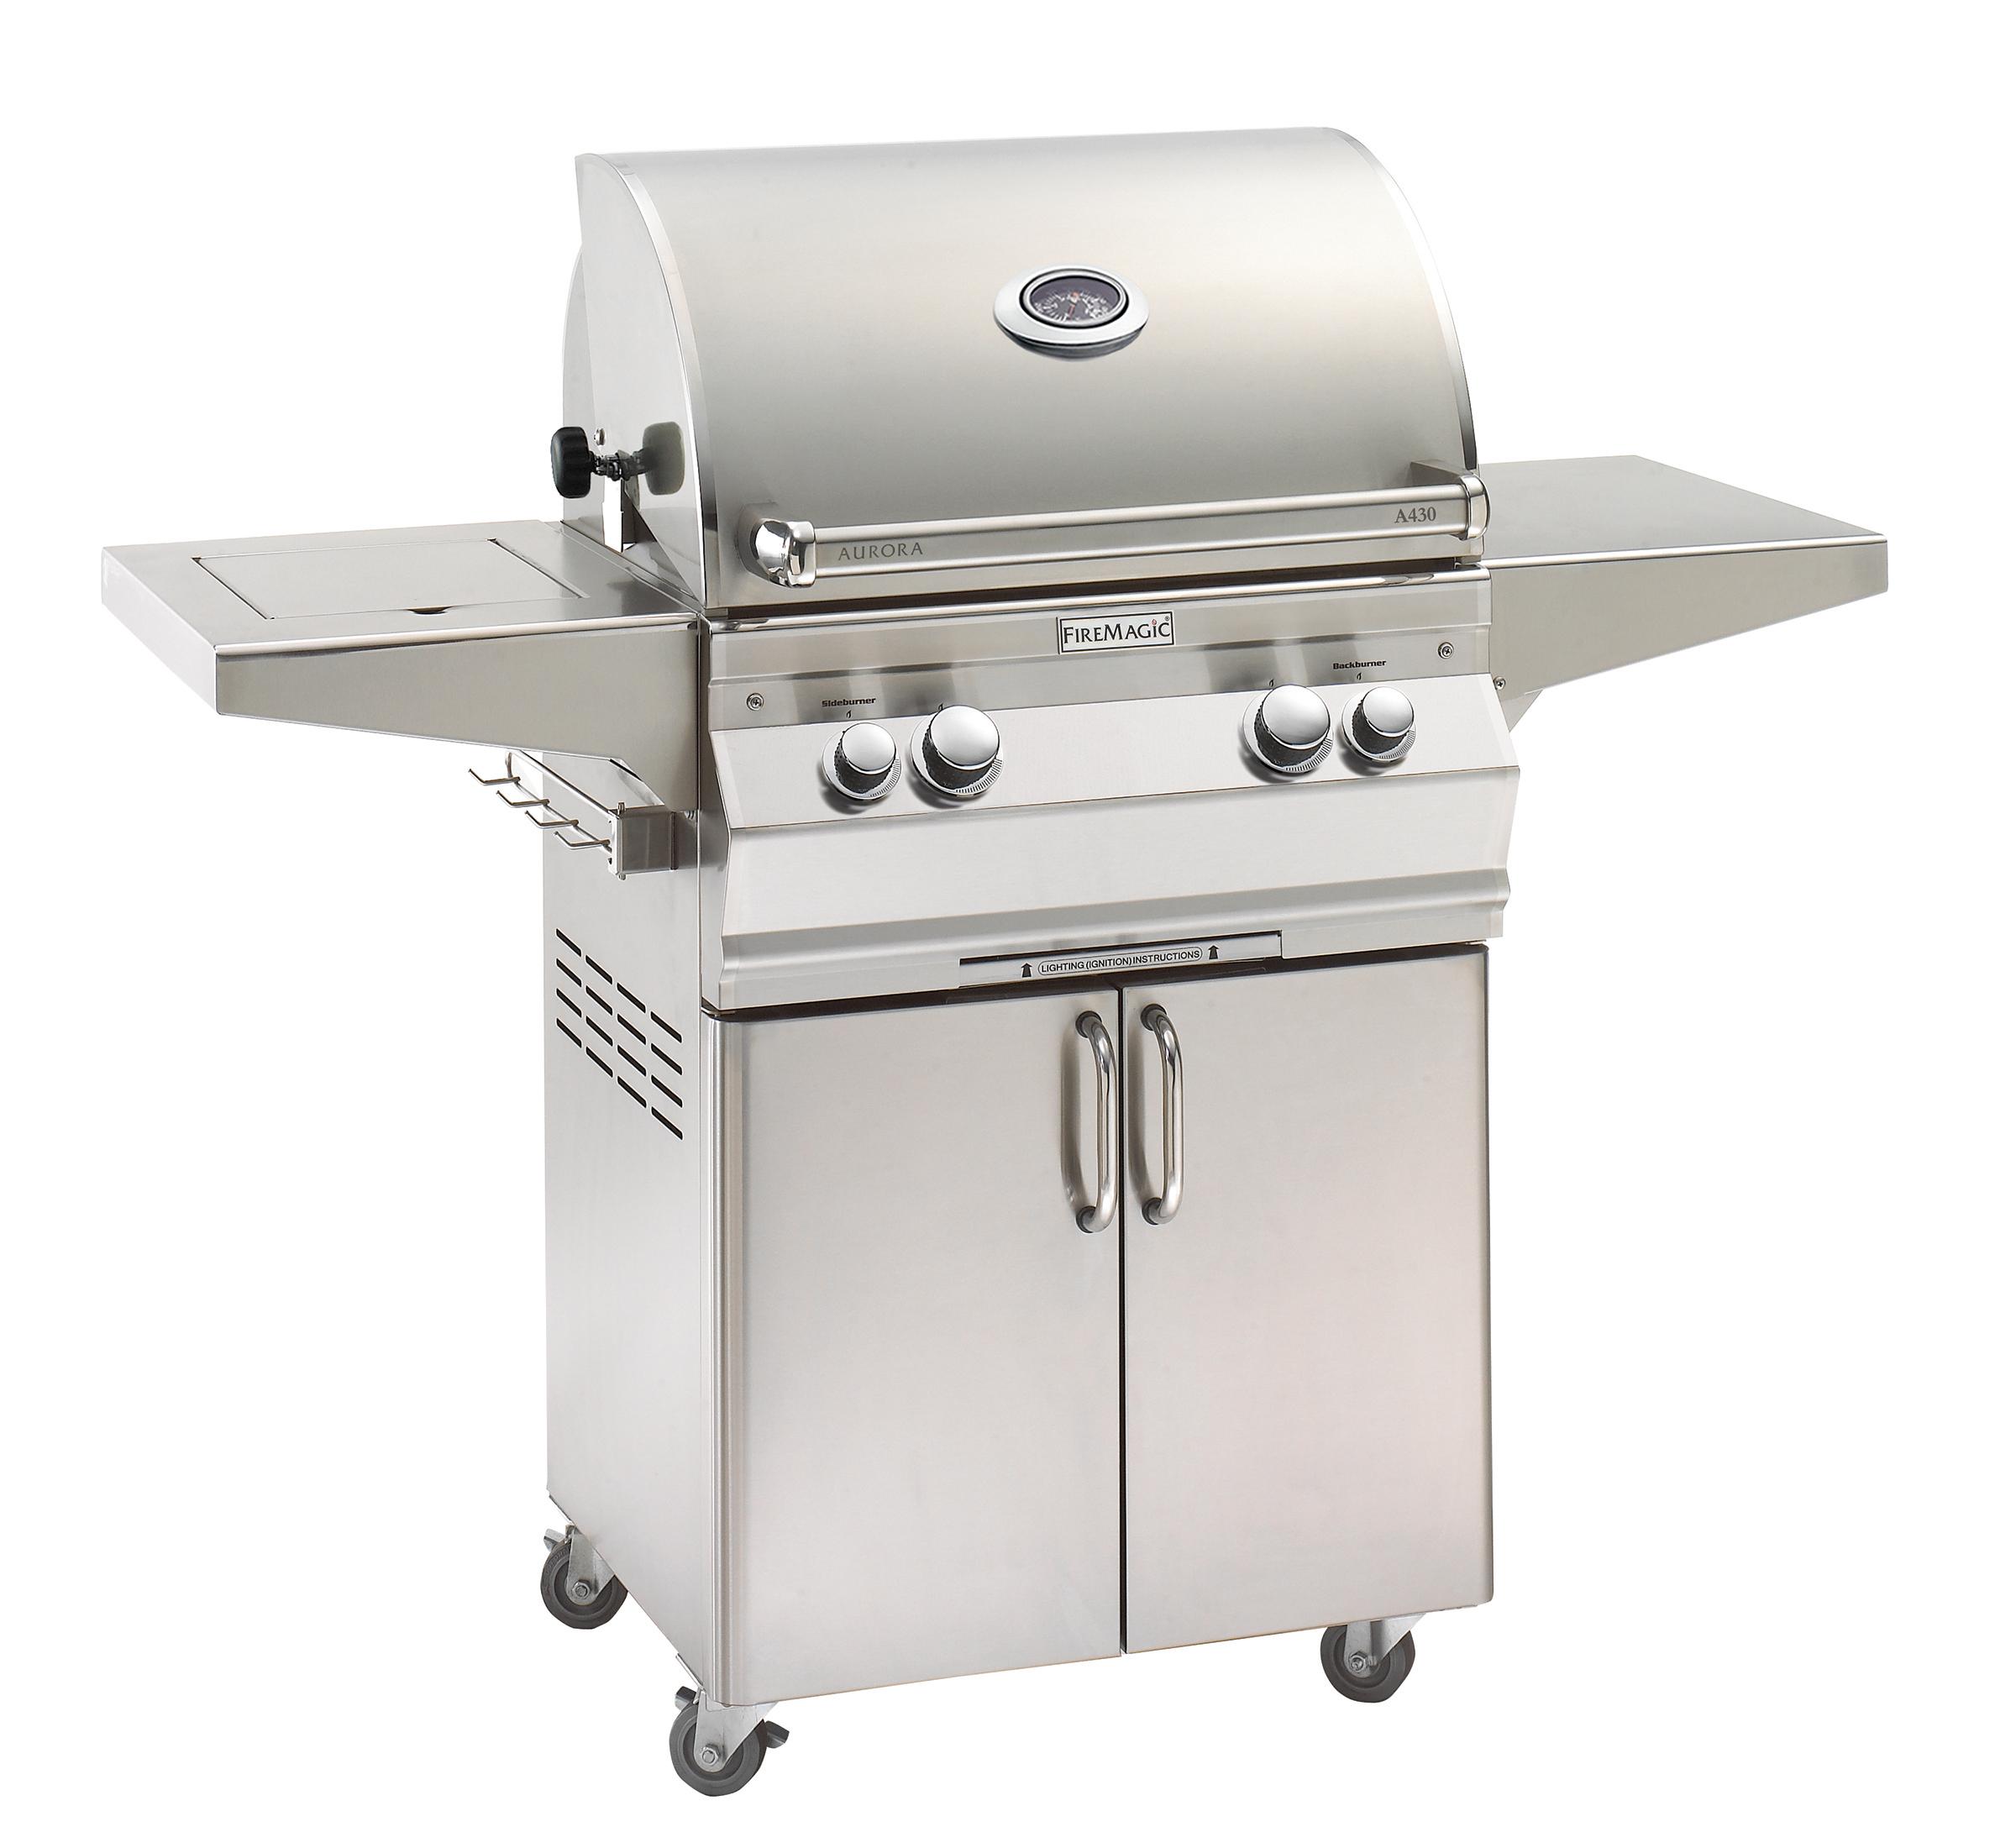 fm-a430s-aurora-analog-portable-grill.jpg